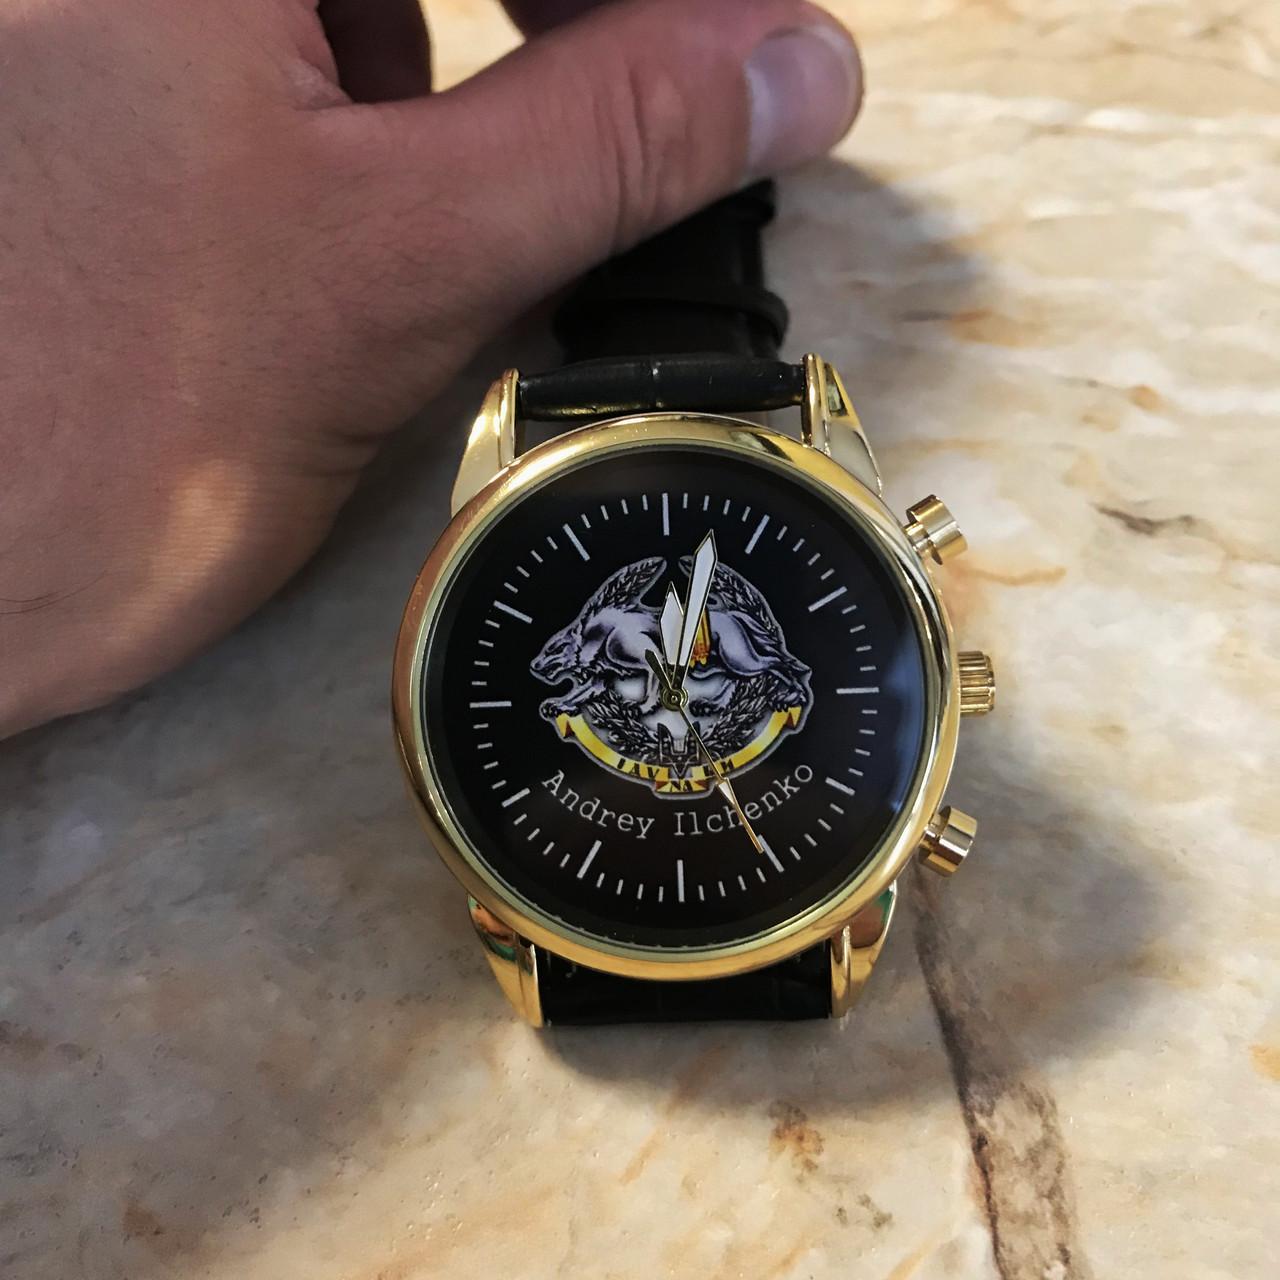 Часы наручные с логотипом ССО (Сили спеціальних операцій України)